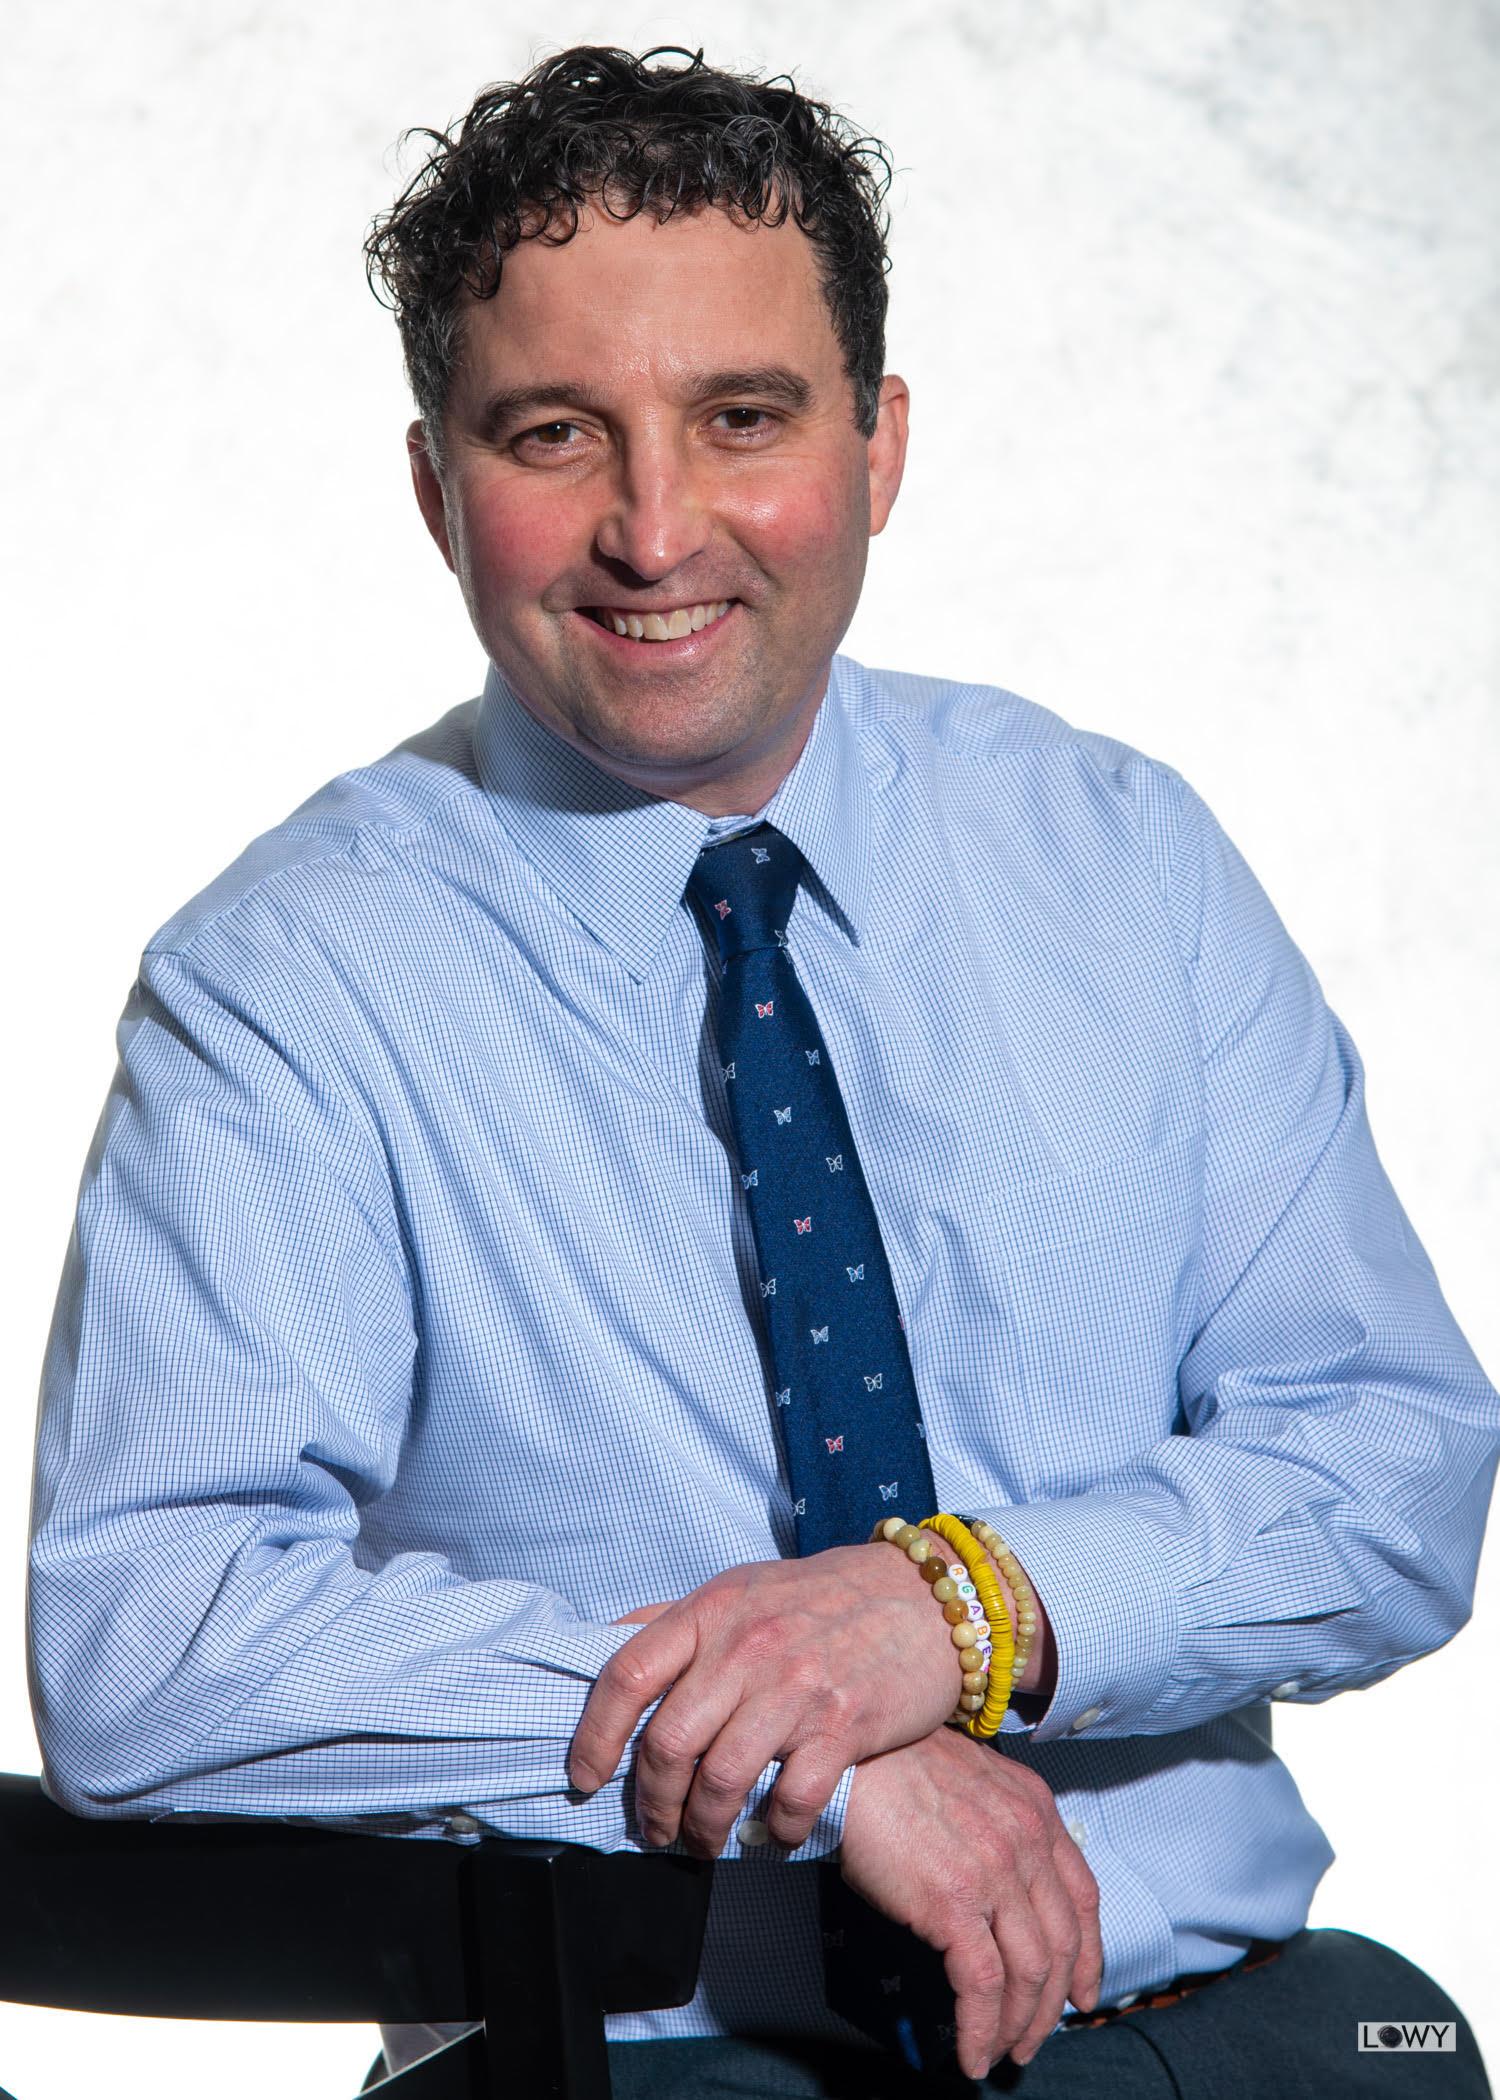 Matt R. Mittman